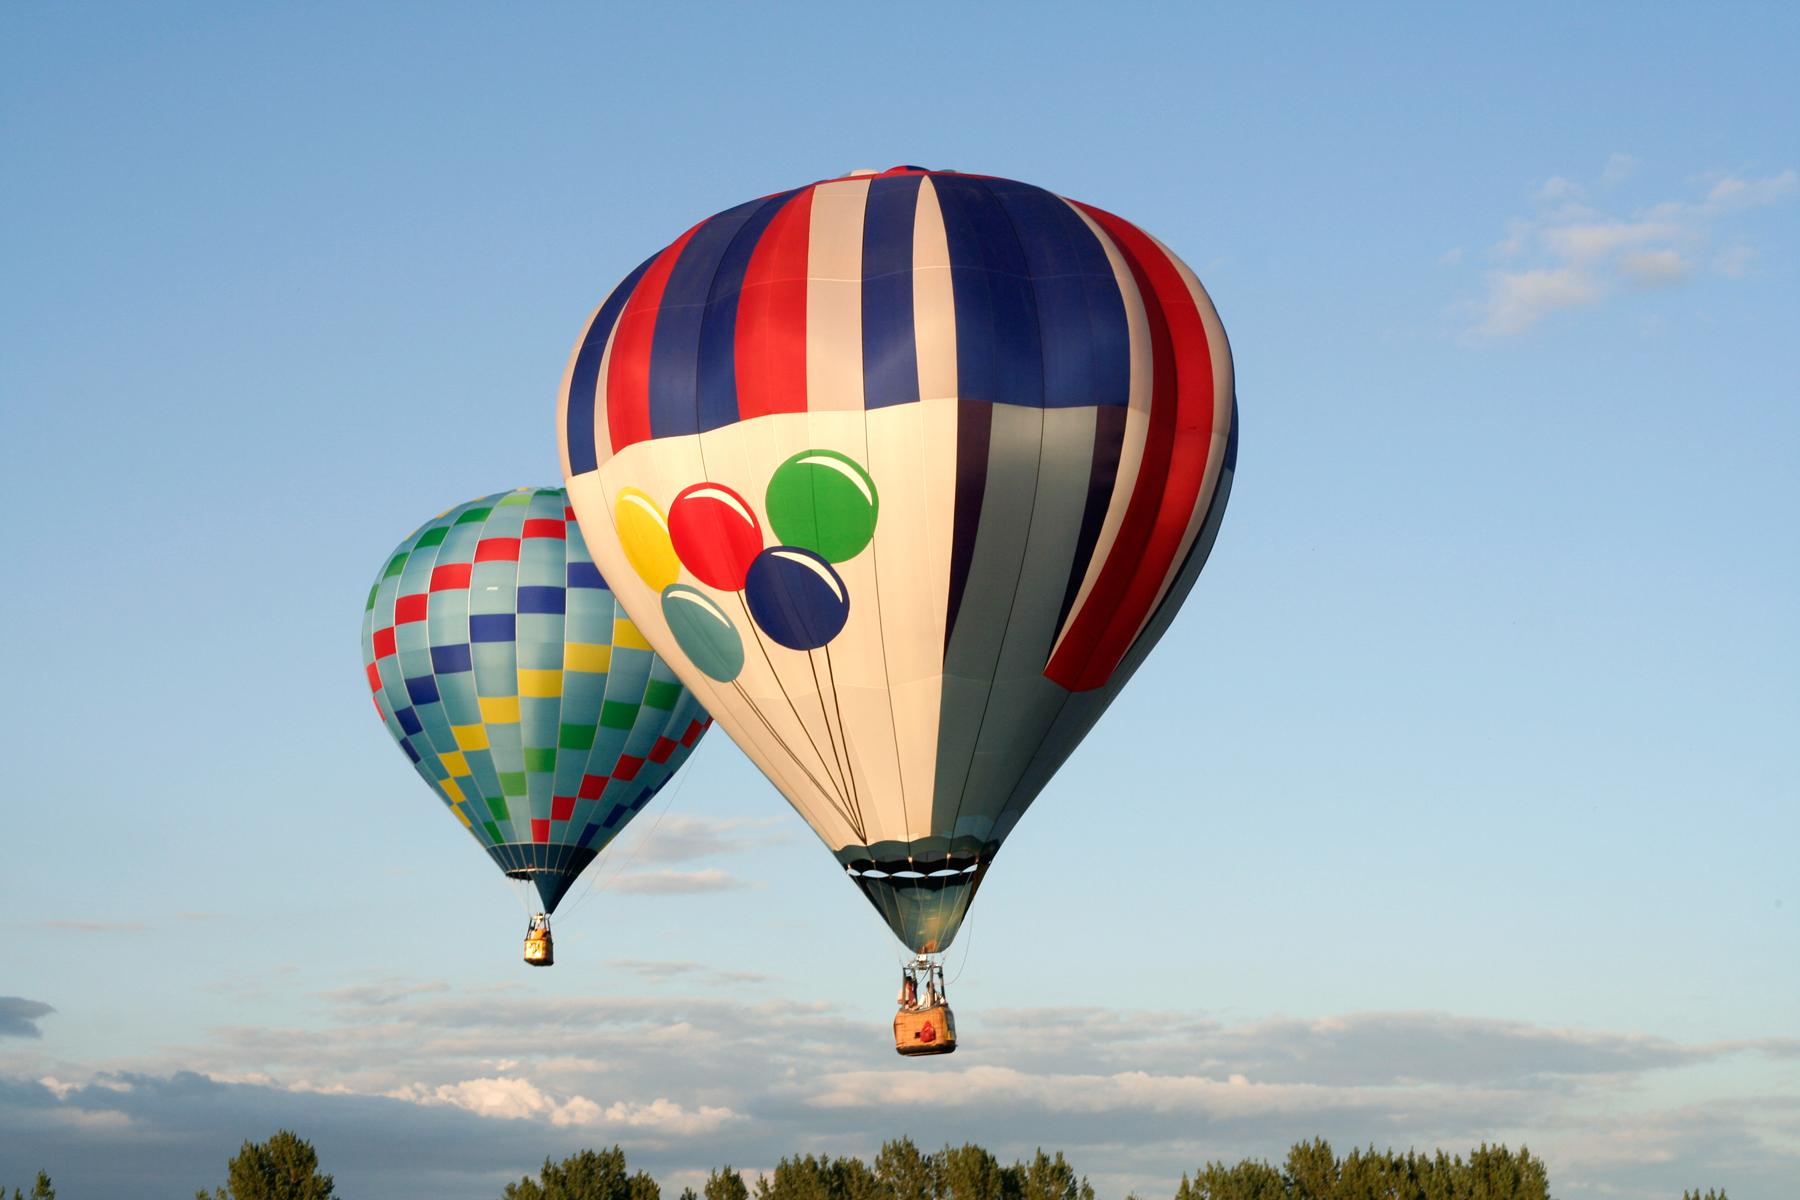 Hot Air Balloons, Adventure, Photo, Scenery, Scene, HQ Photo